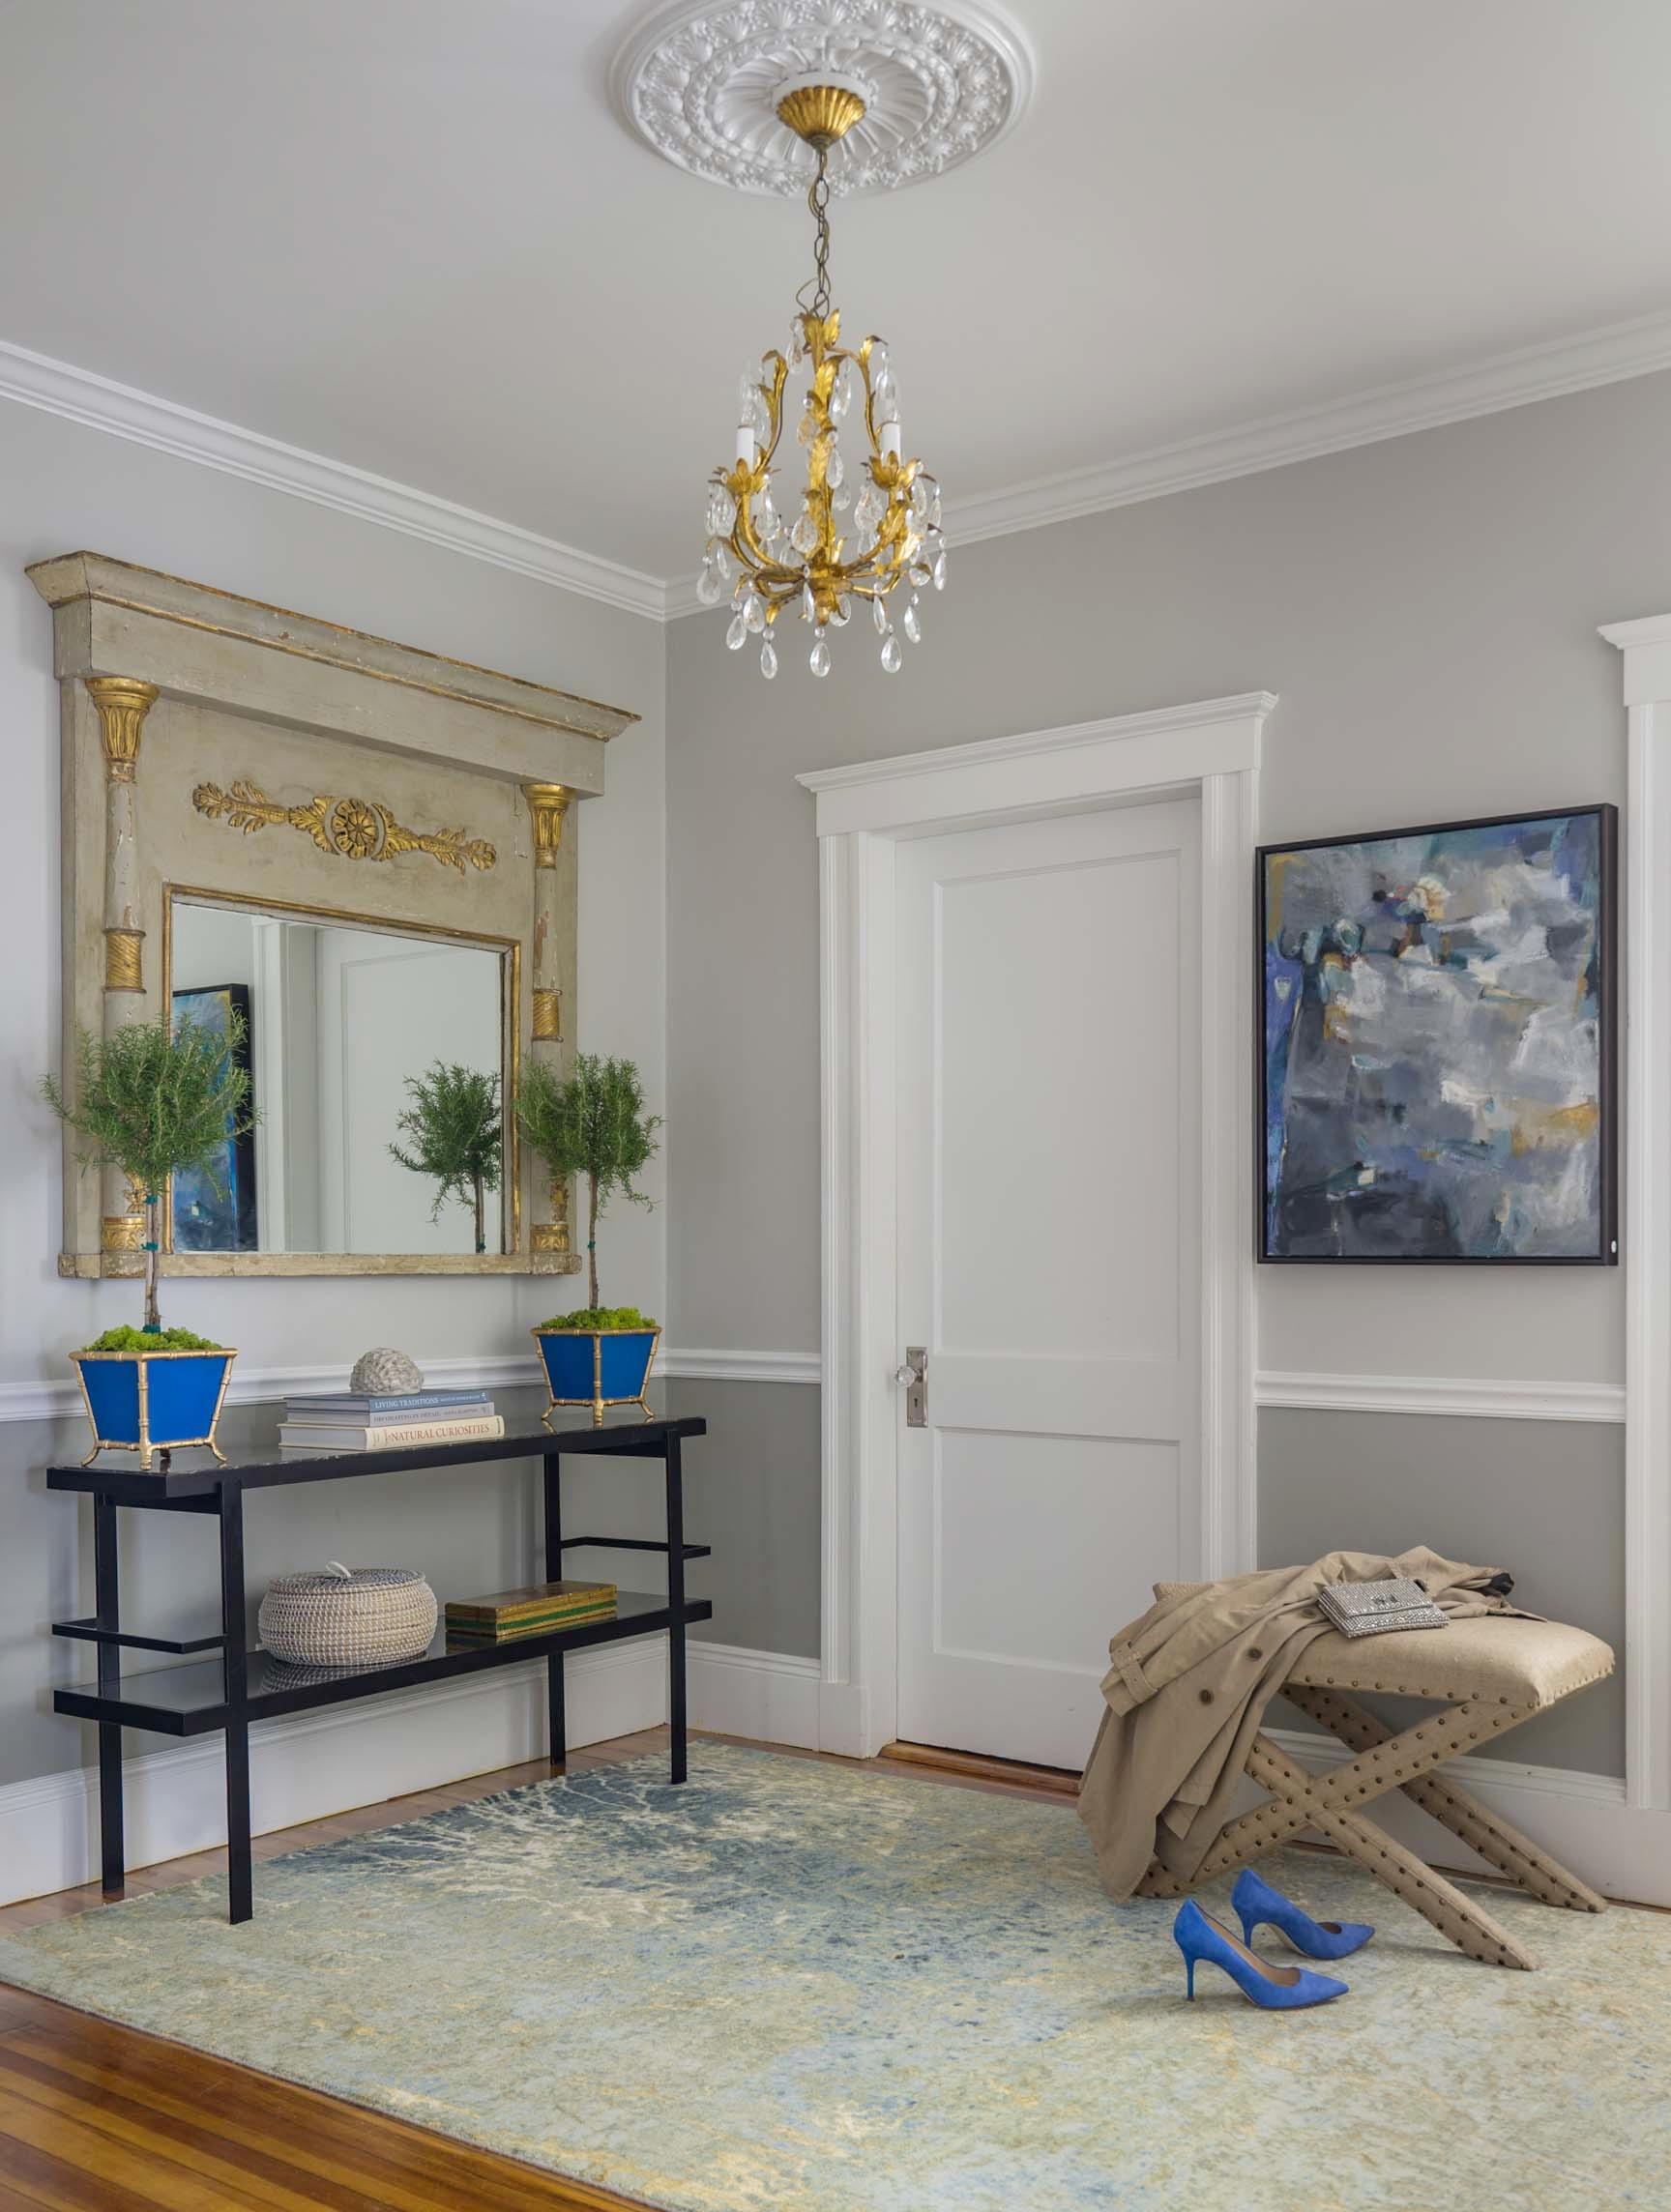 Boston entry foyer hall room interior design by Dane Austin Design